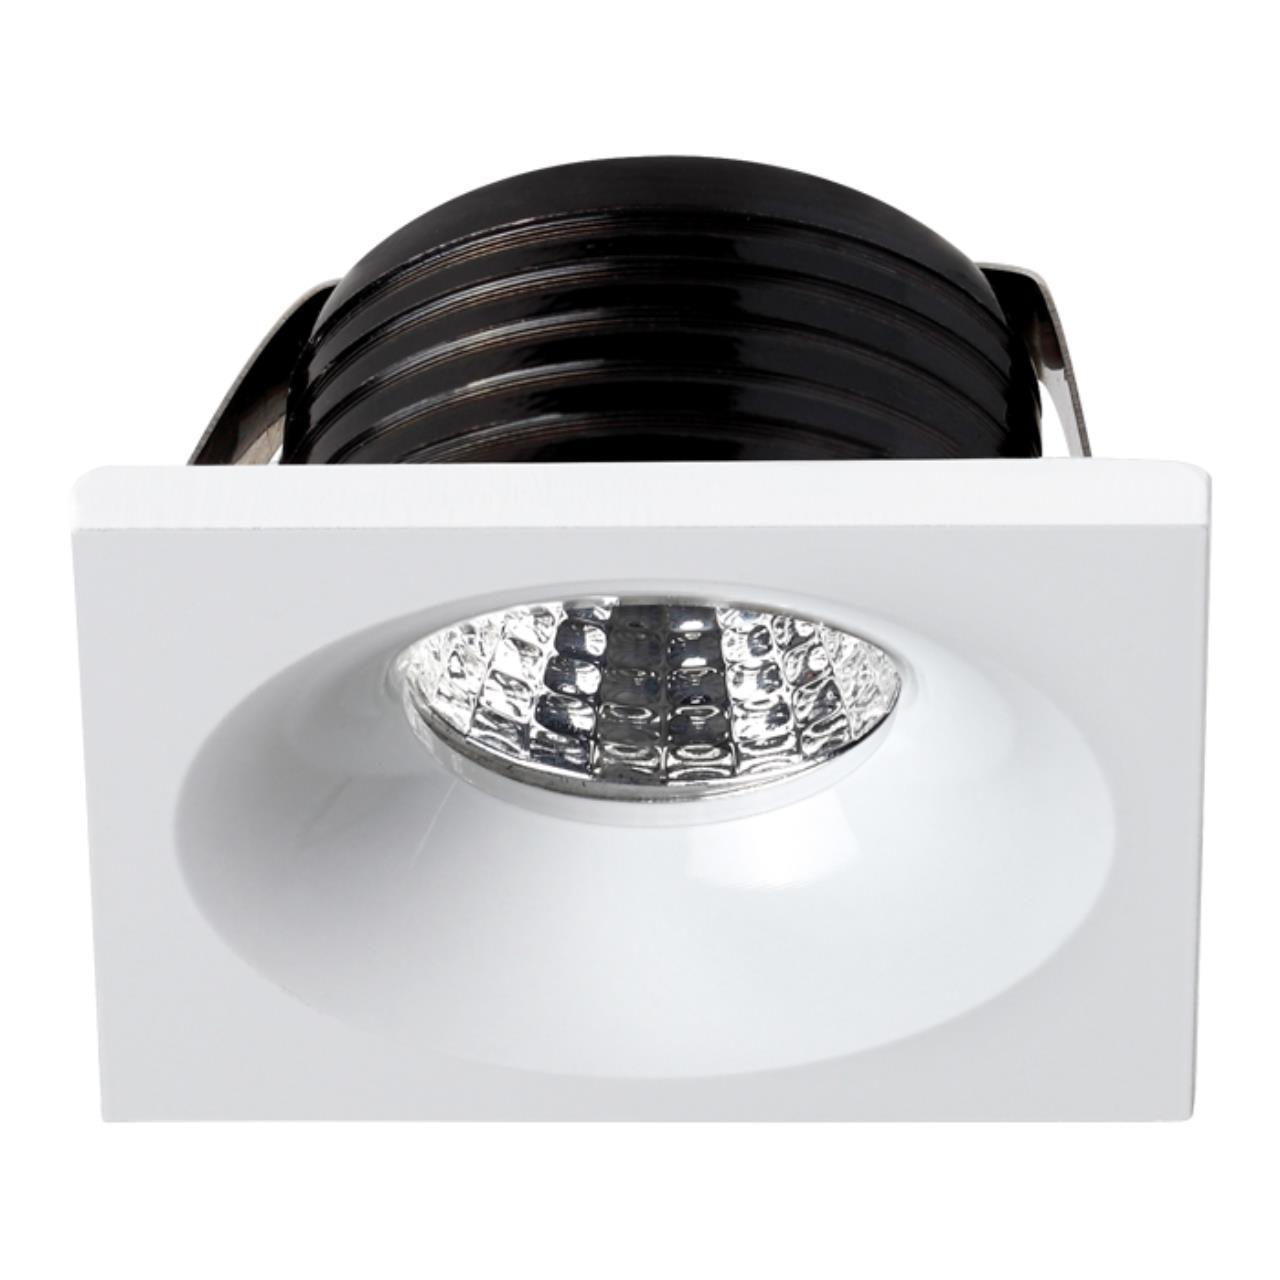 357701 SPOT NT18 090 белый Встраиваемый светильник IP20 LED 3000K 3W 160-265V DOT